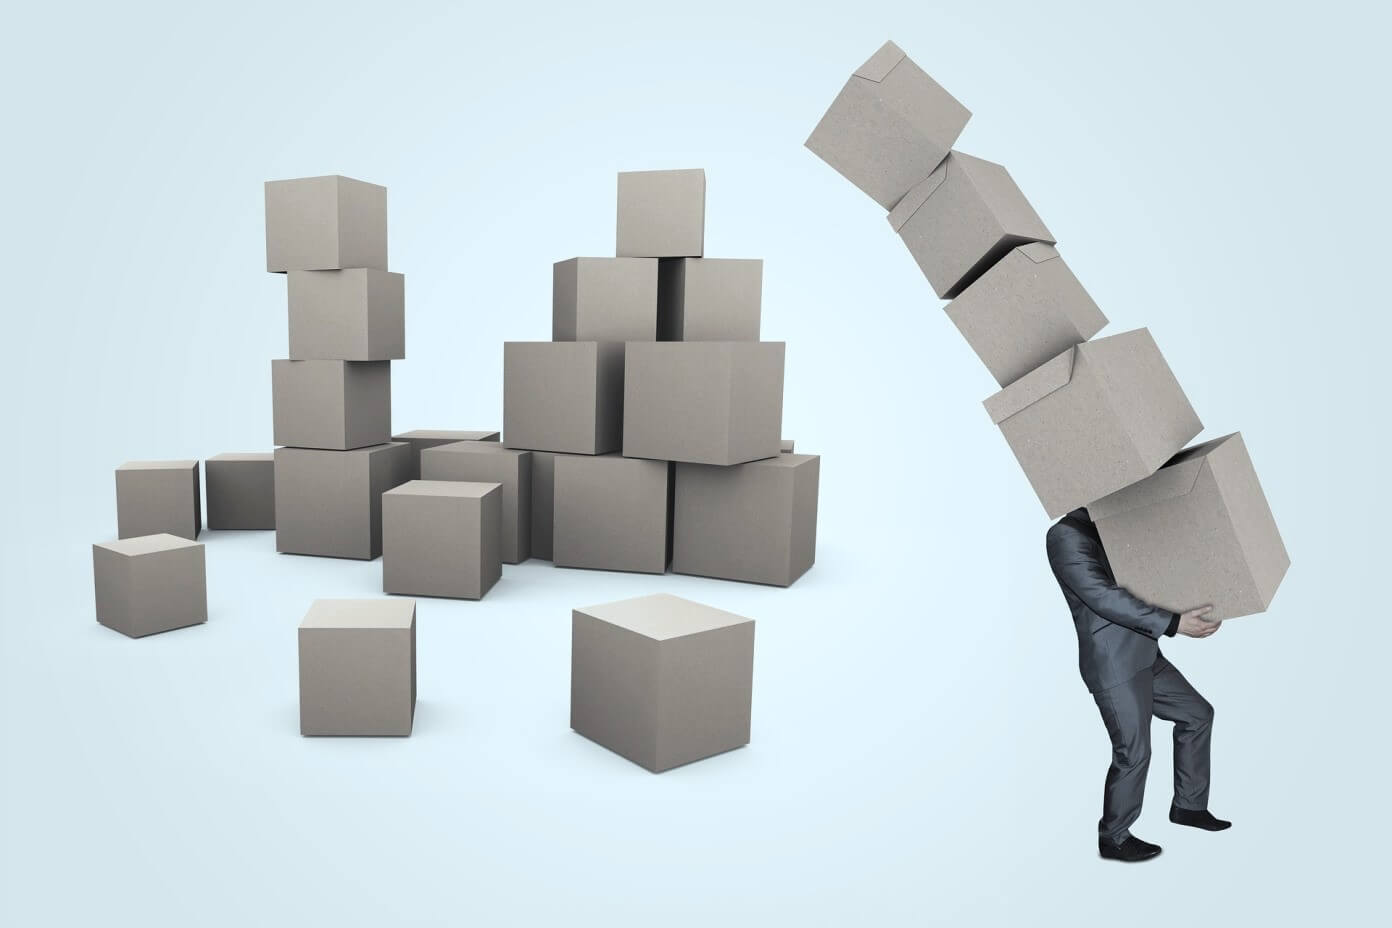 The Future Trends in Logistics